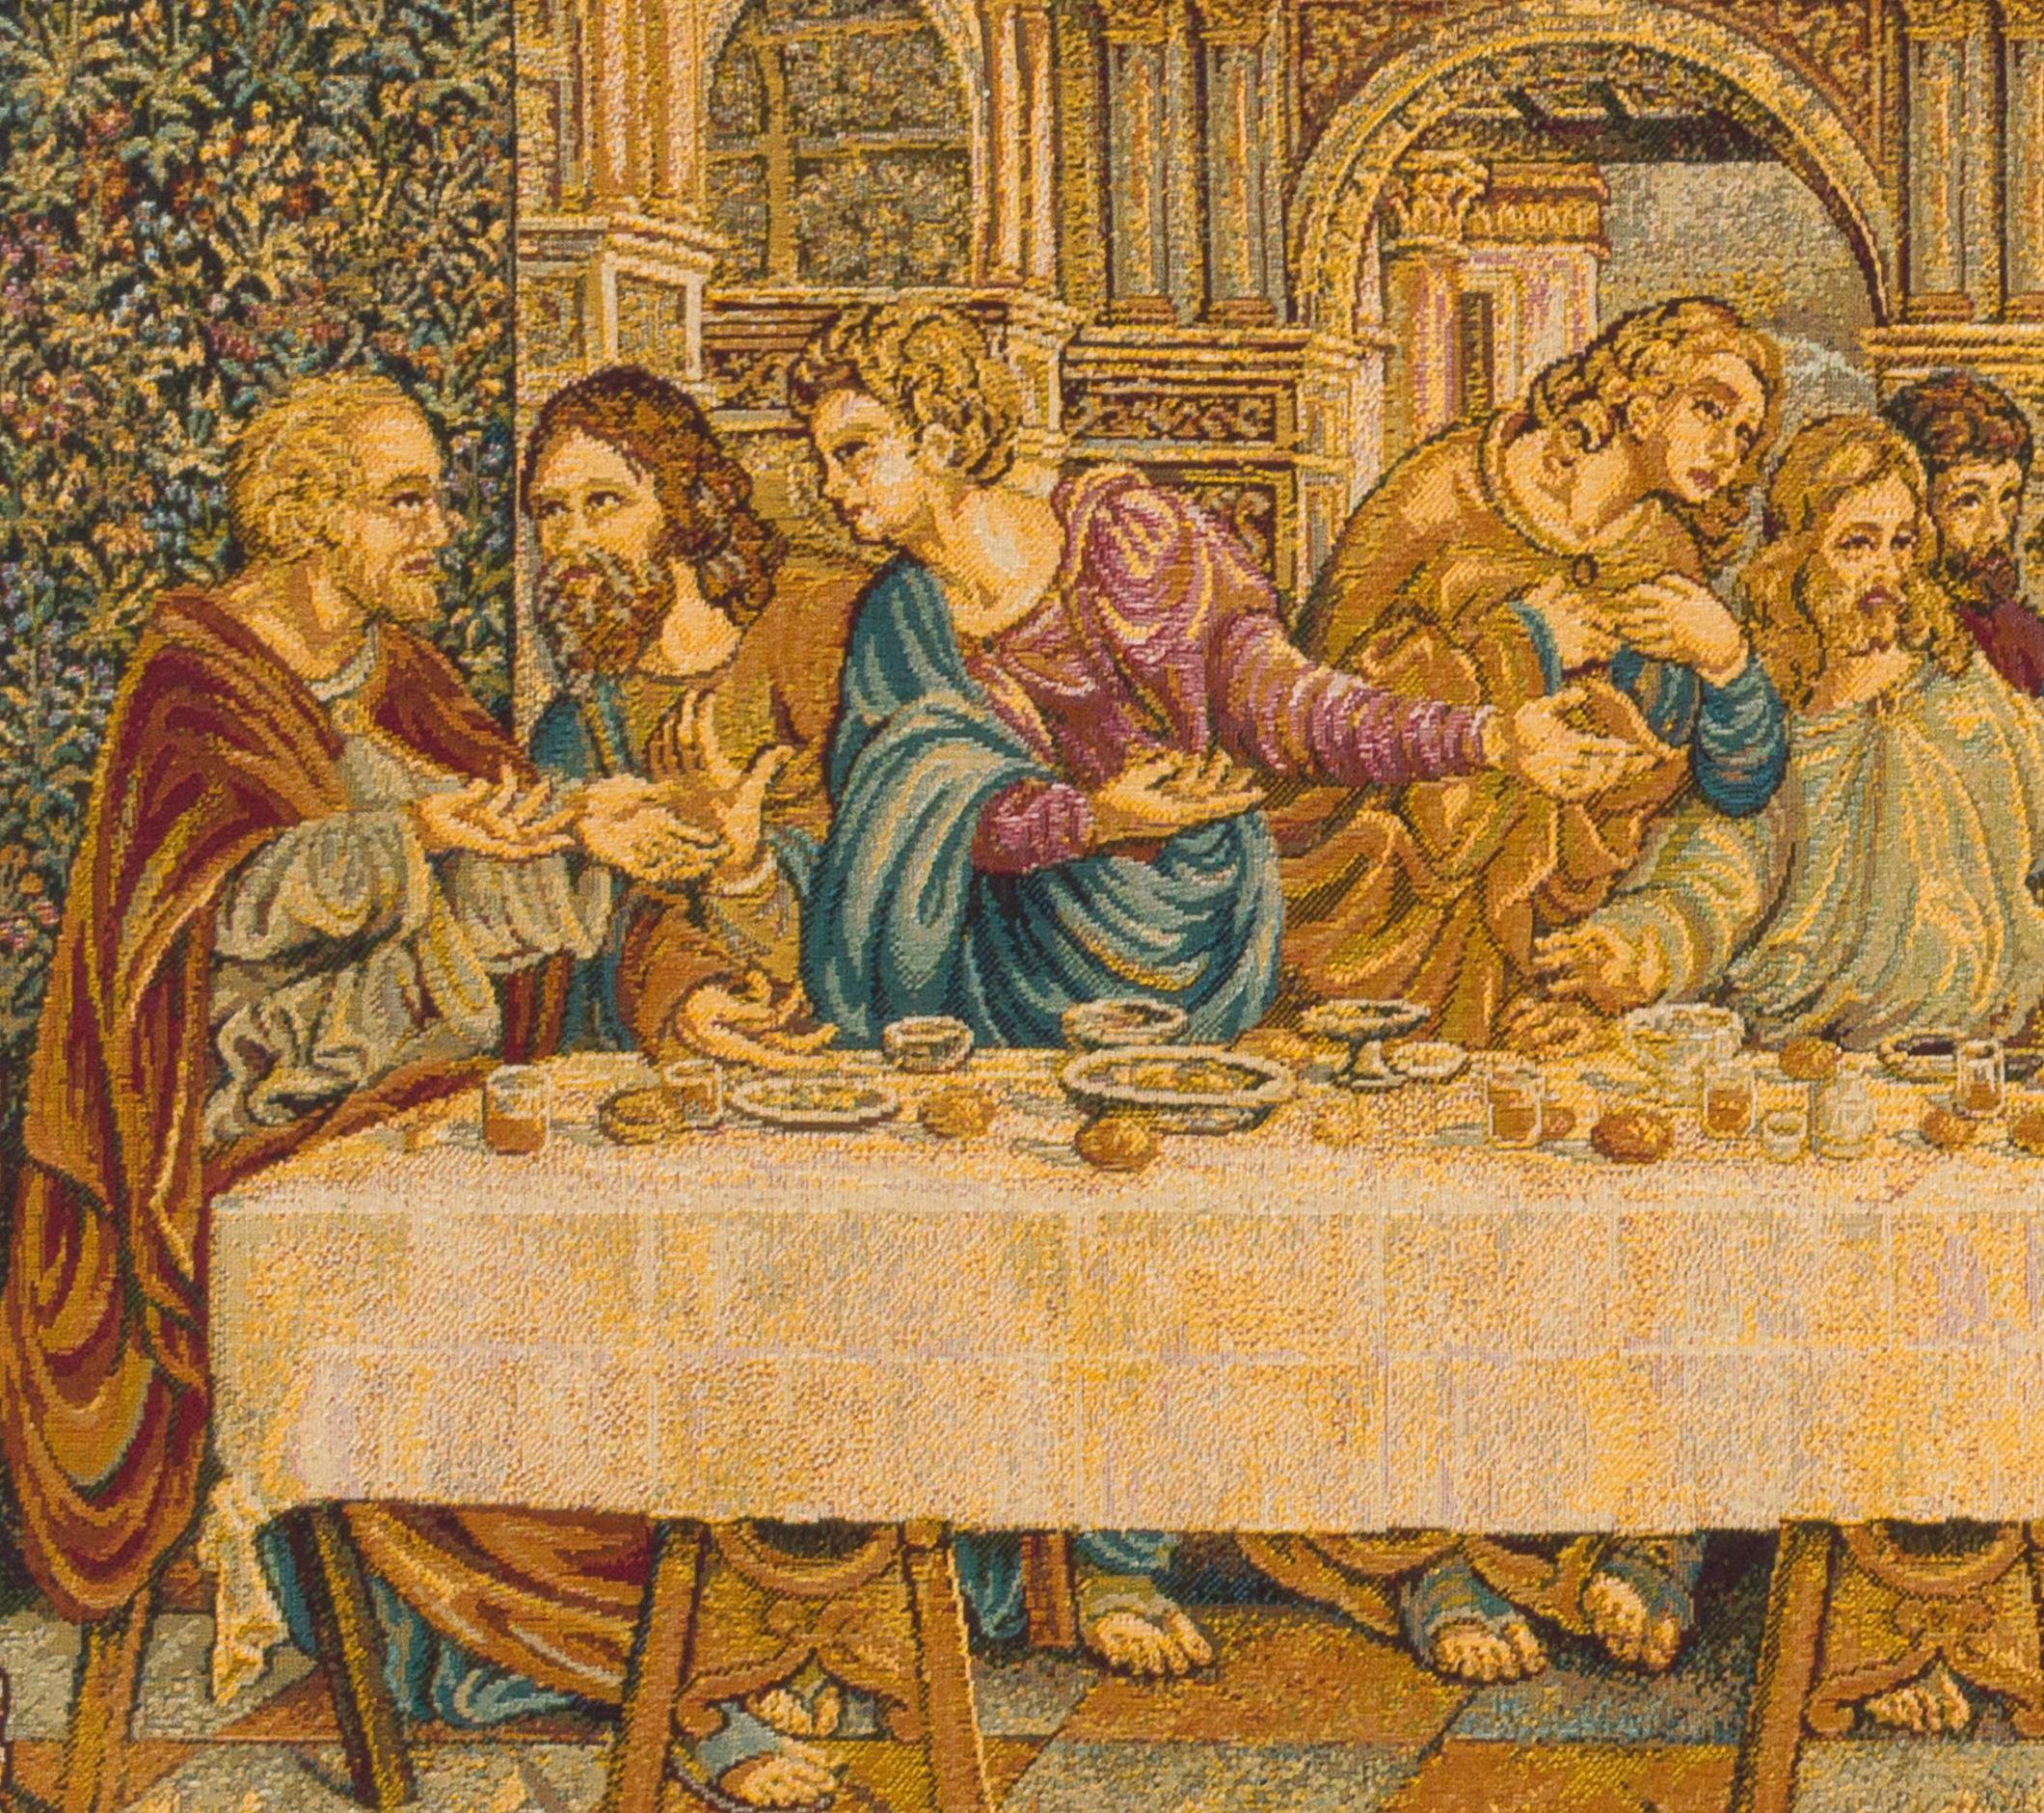 Popular Blended Fabric Leonardo Davinci The Last Supper Wall Hangings Regarding Last Supper Tapestry Wall Hanging Woven Leonardo Da Vinci (View 14 of 20)